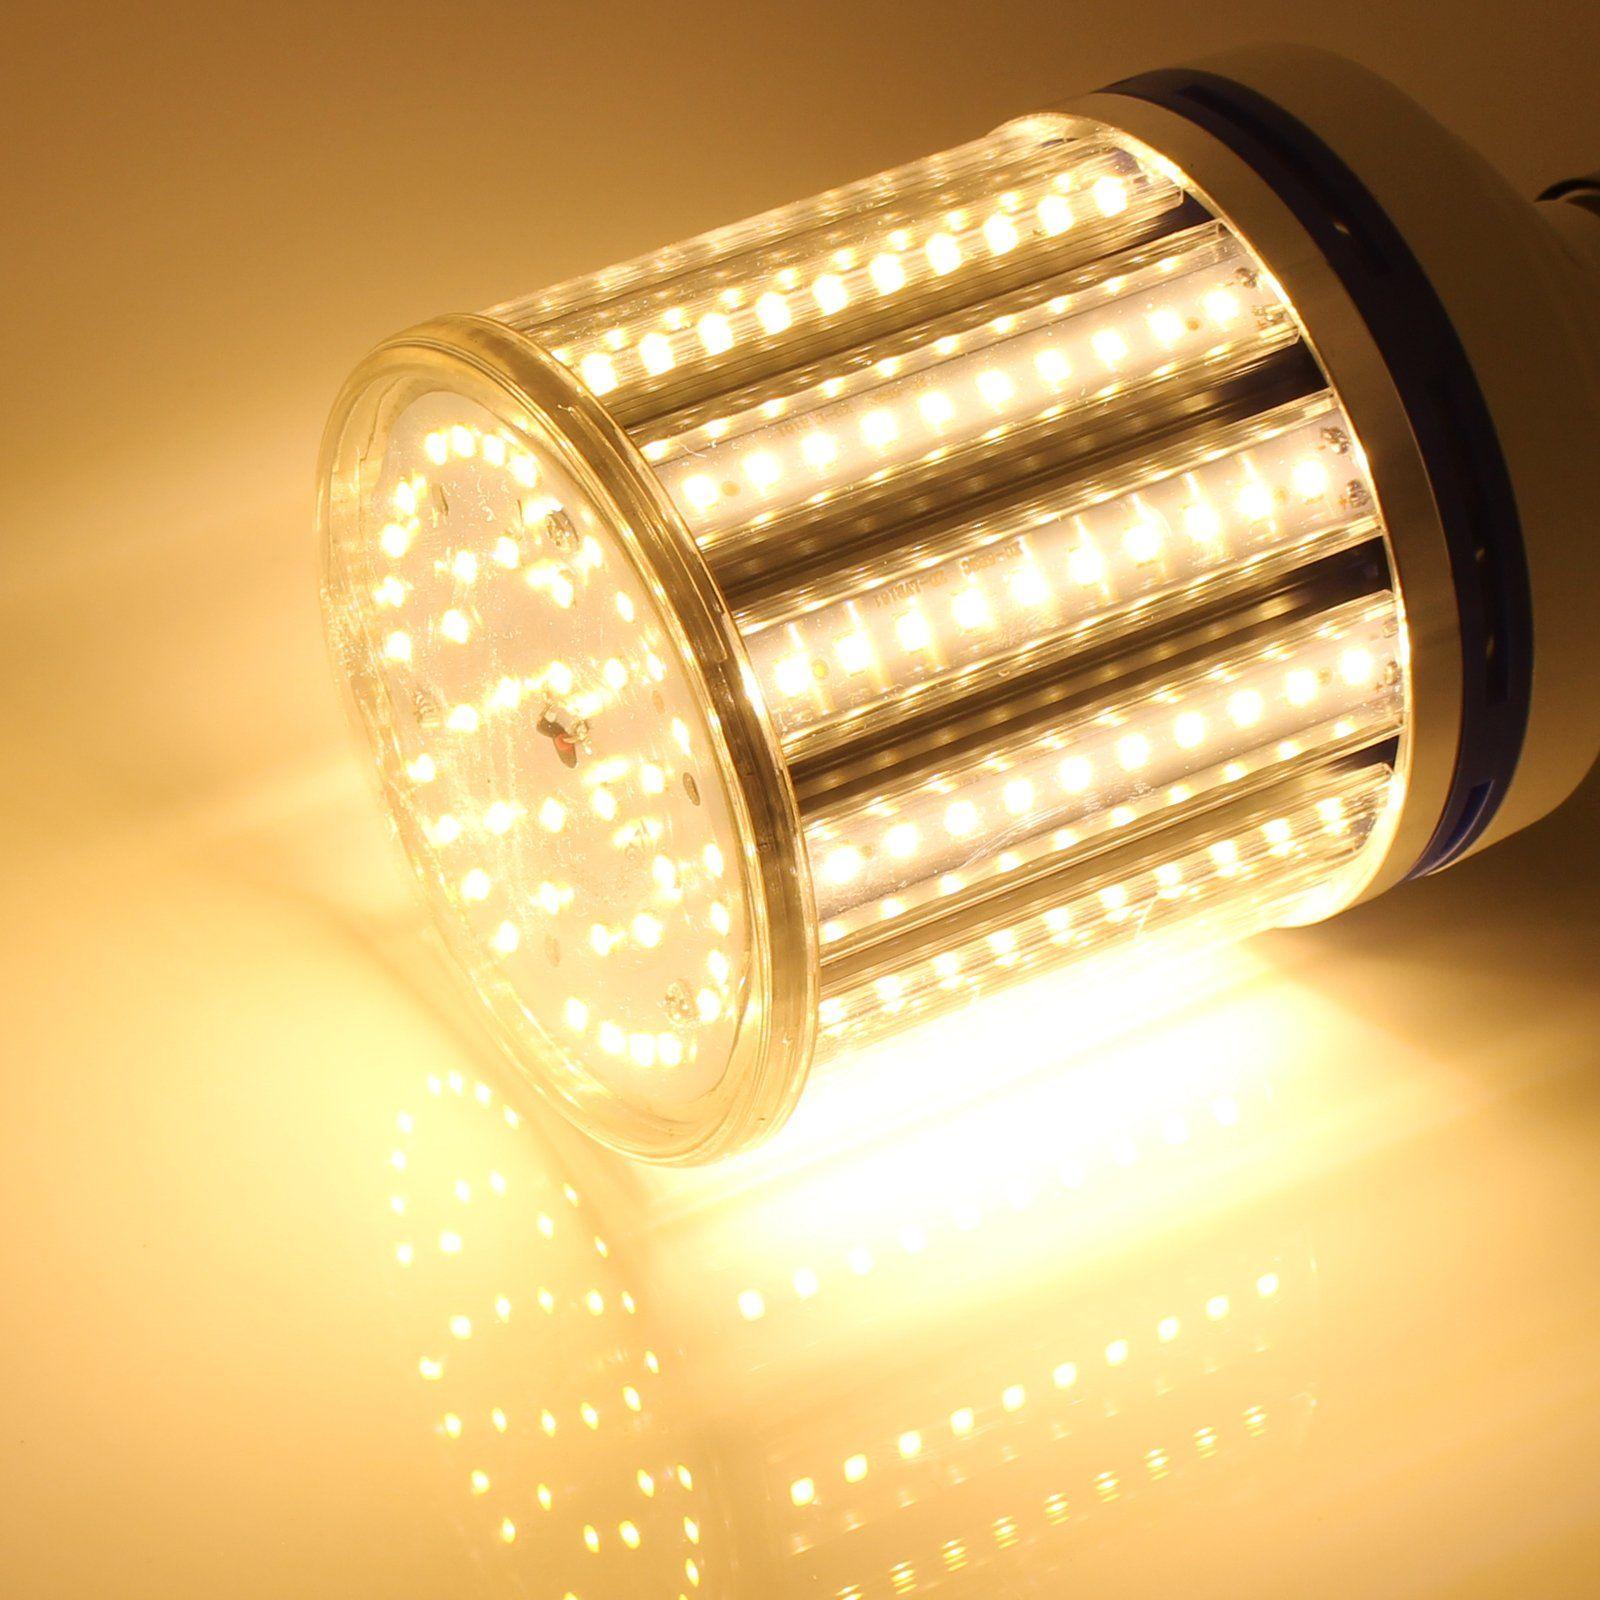 Mininono Ultra Bright Led Bulb Warm White 3000k Medium Edison E26 E27 Base 30w Commercial Retrofit Light Bulbs 250300 Watt Equivalen Light Bulb Bulb White Lamp